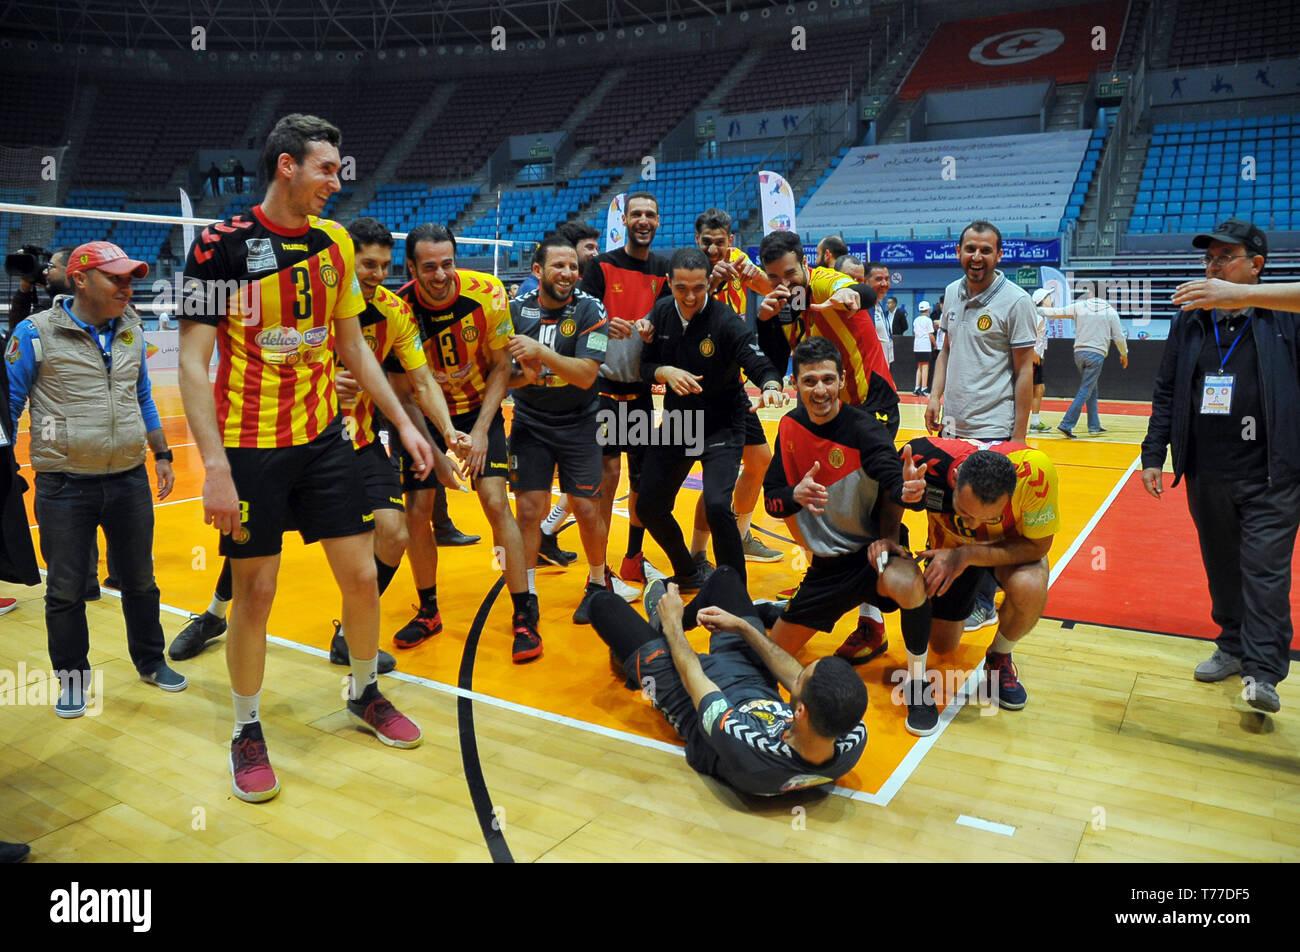 Rades Tunisie 4 Mai 2019 L Equipe De L Esperance Sportive De